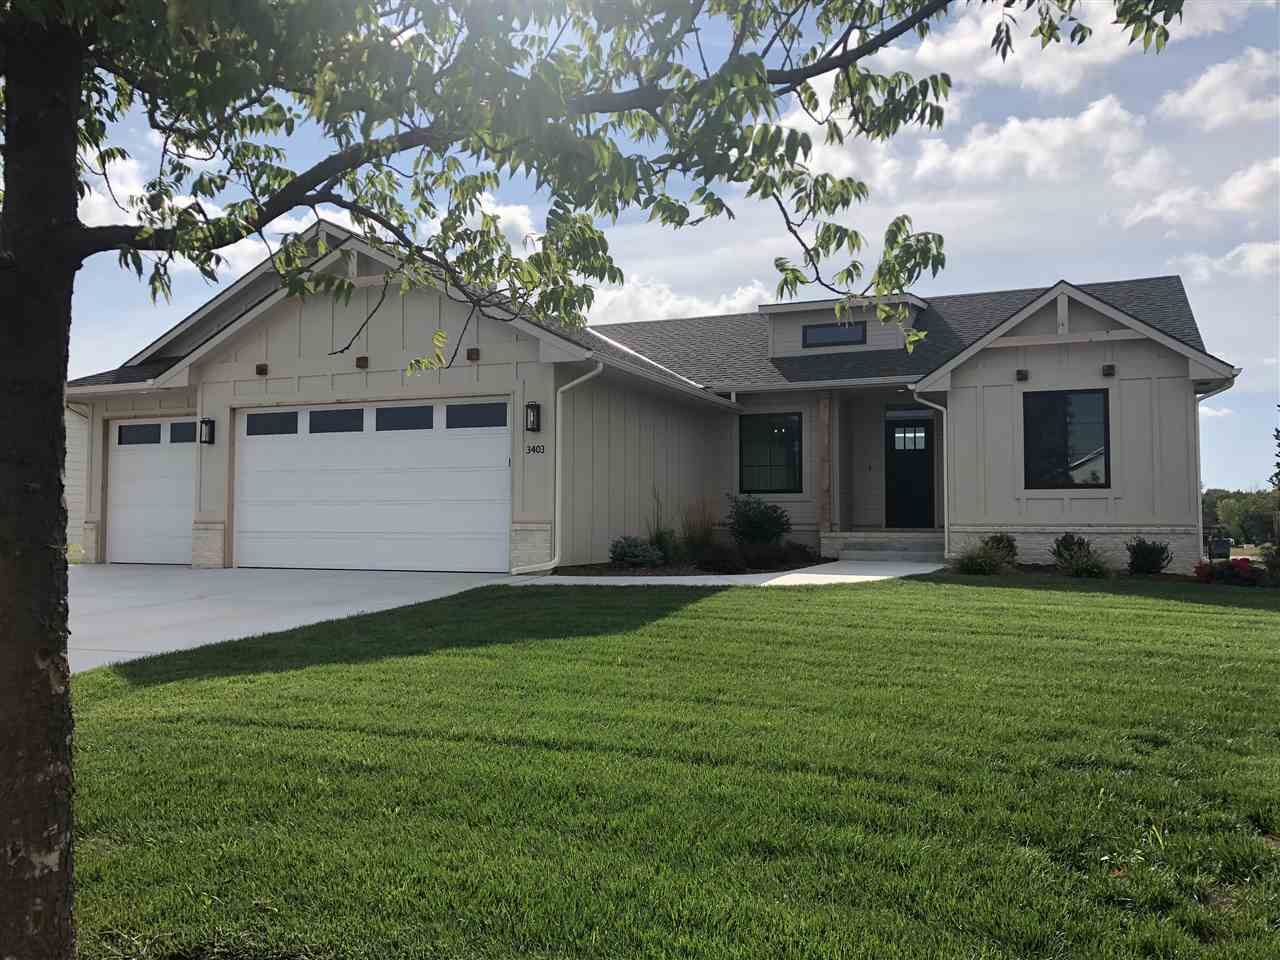 For Sale: 3403 Lori St, Wichita, KS, 67210,